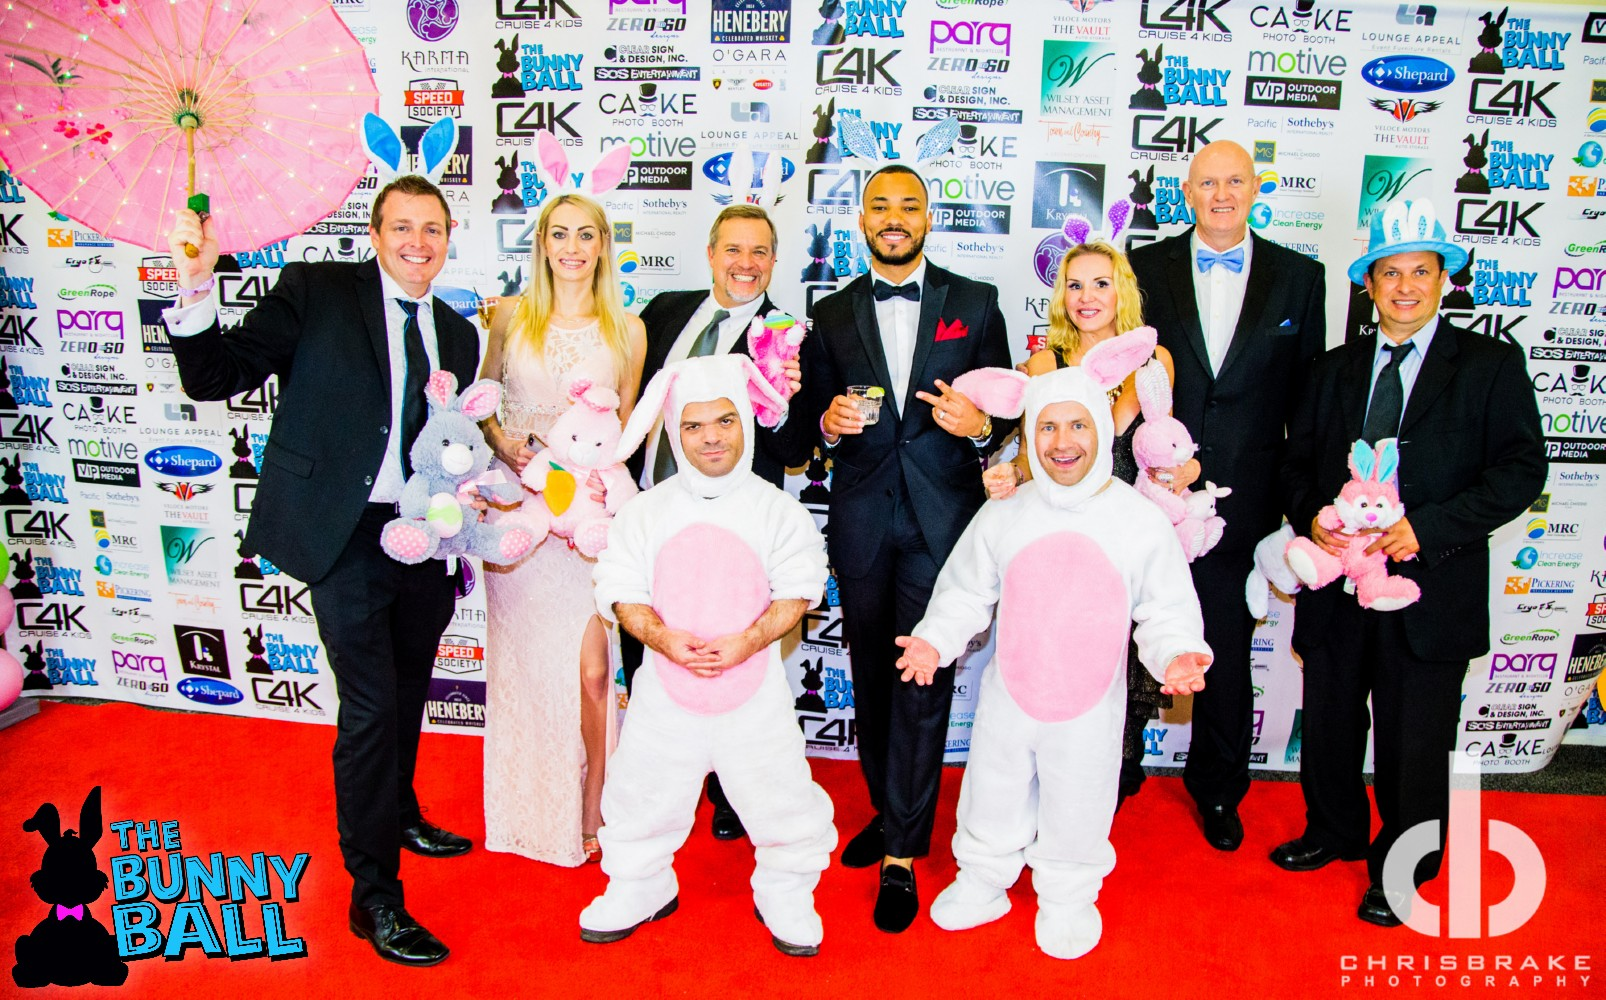 Bunny-Ball-2018-Chris-Brake- 146.jpg